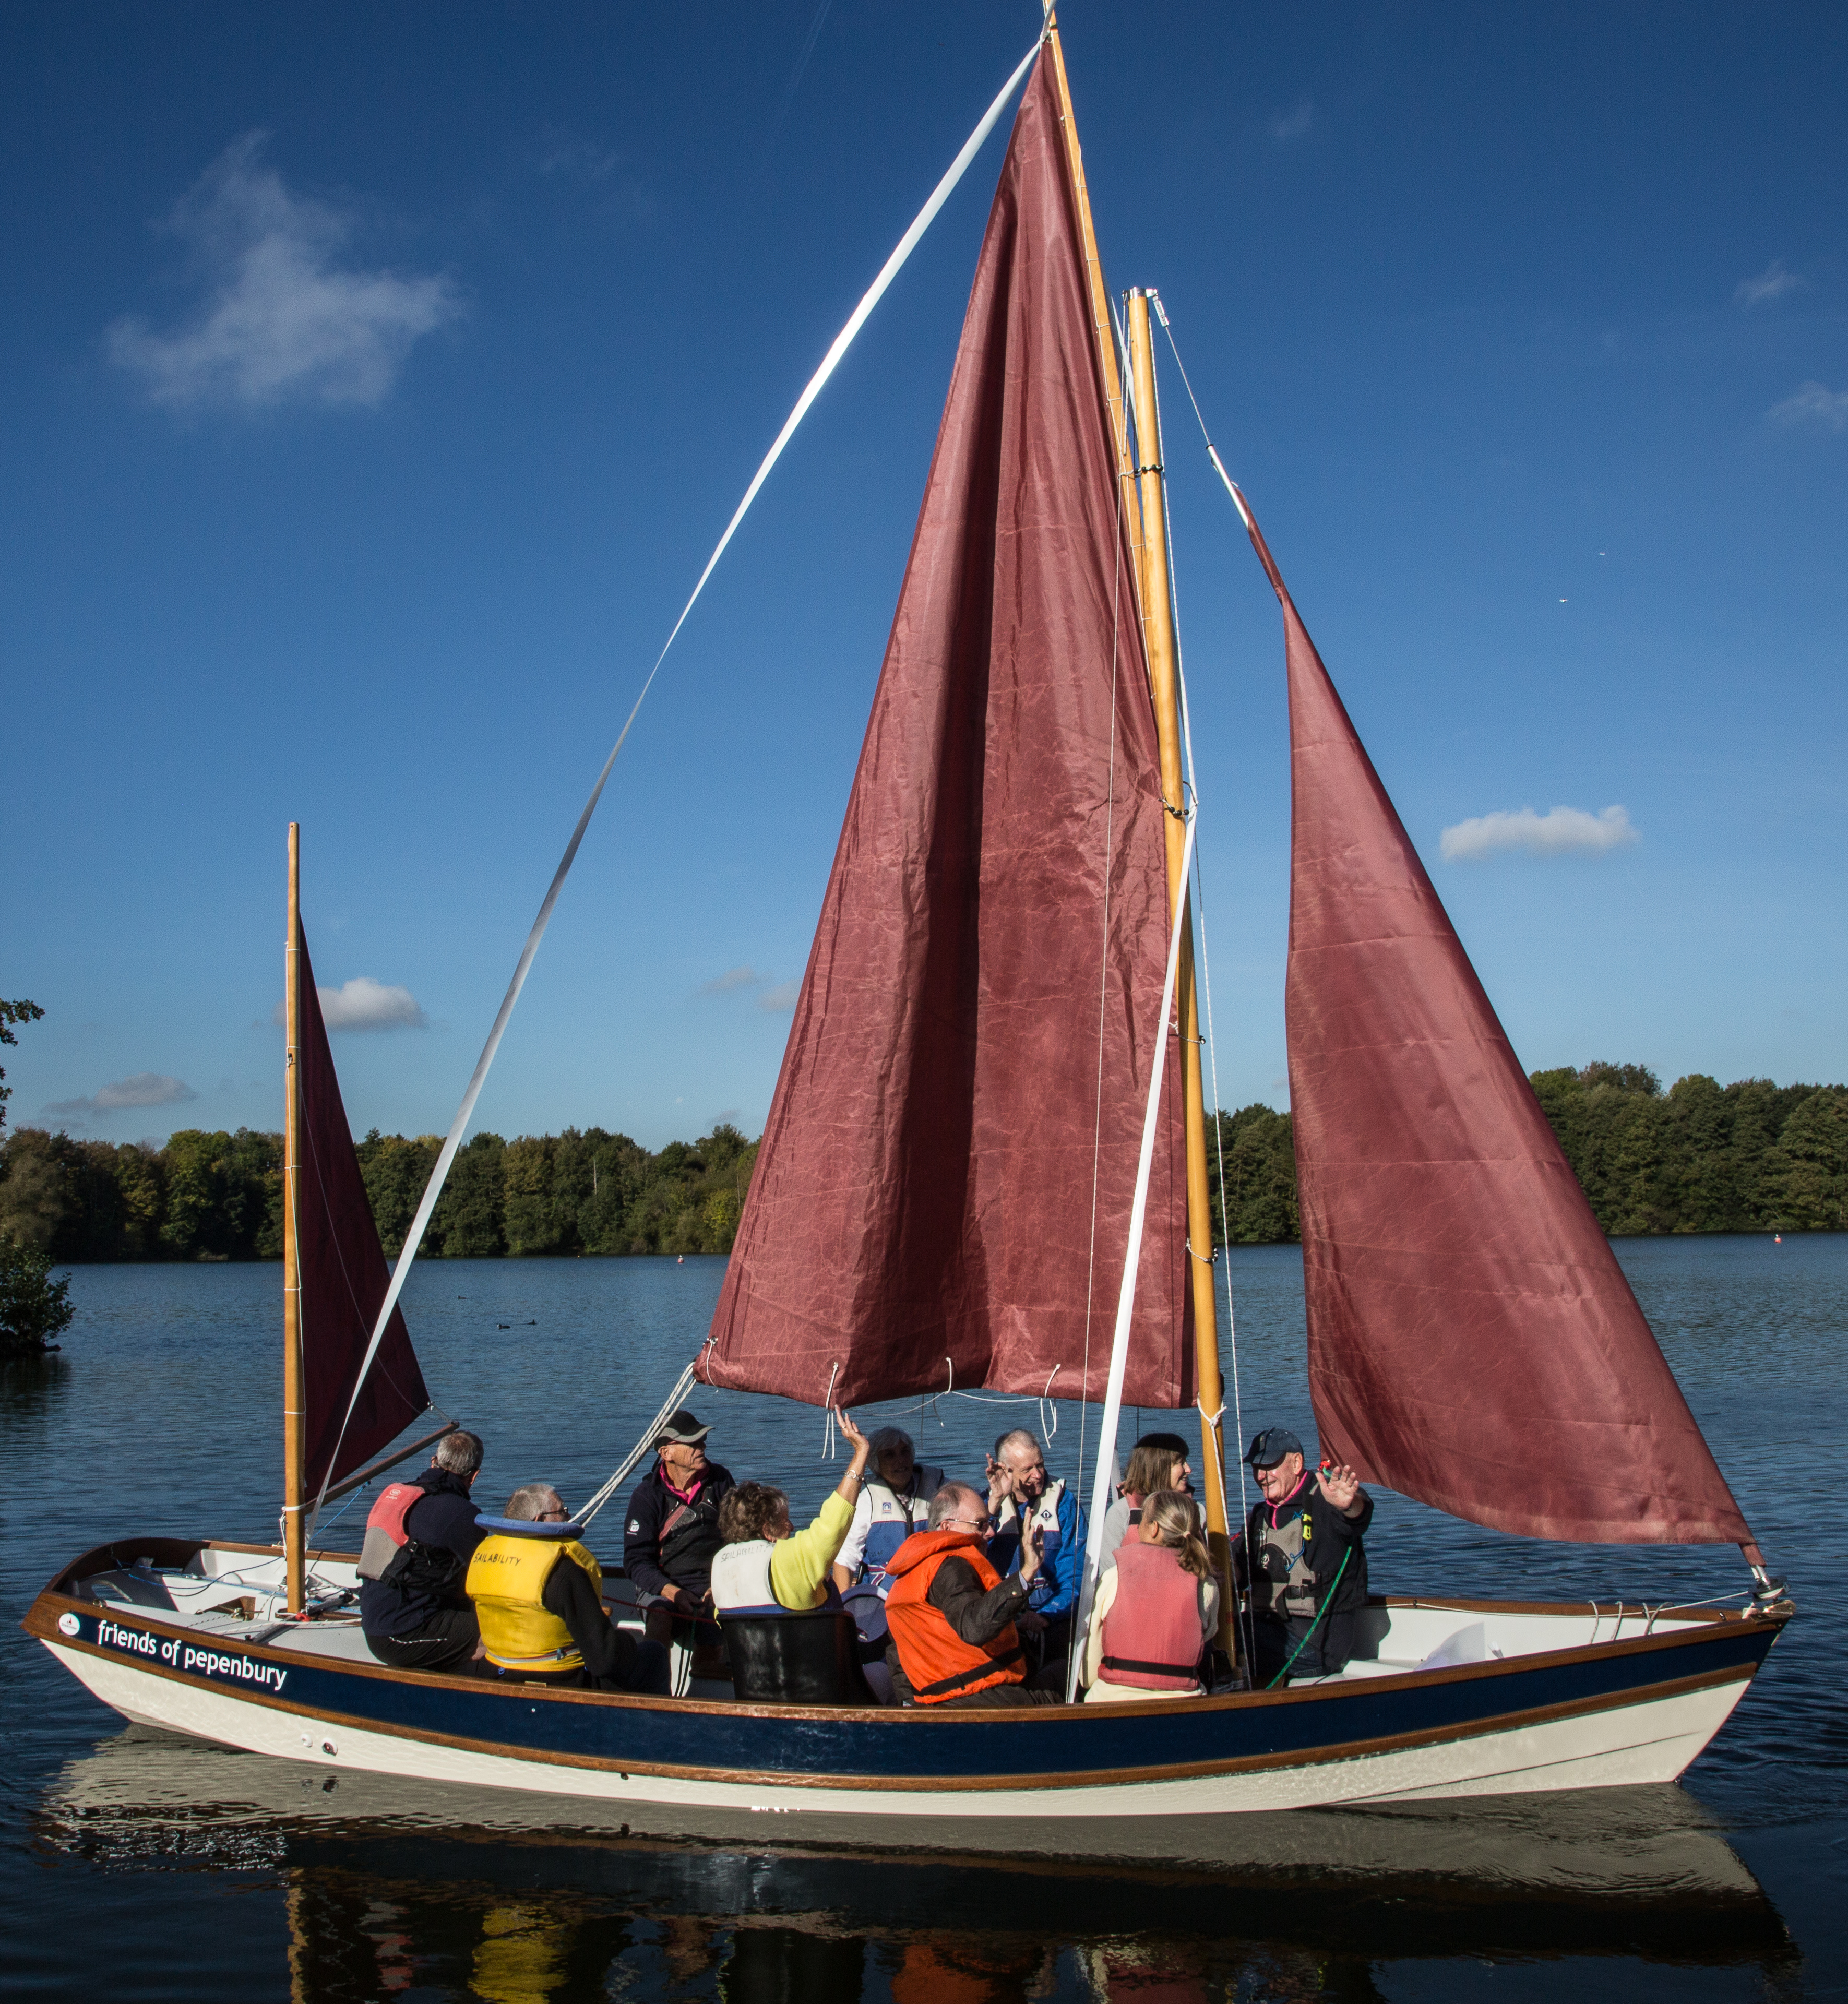 friends of pepenbury sailing away